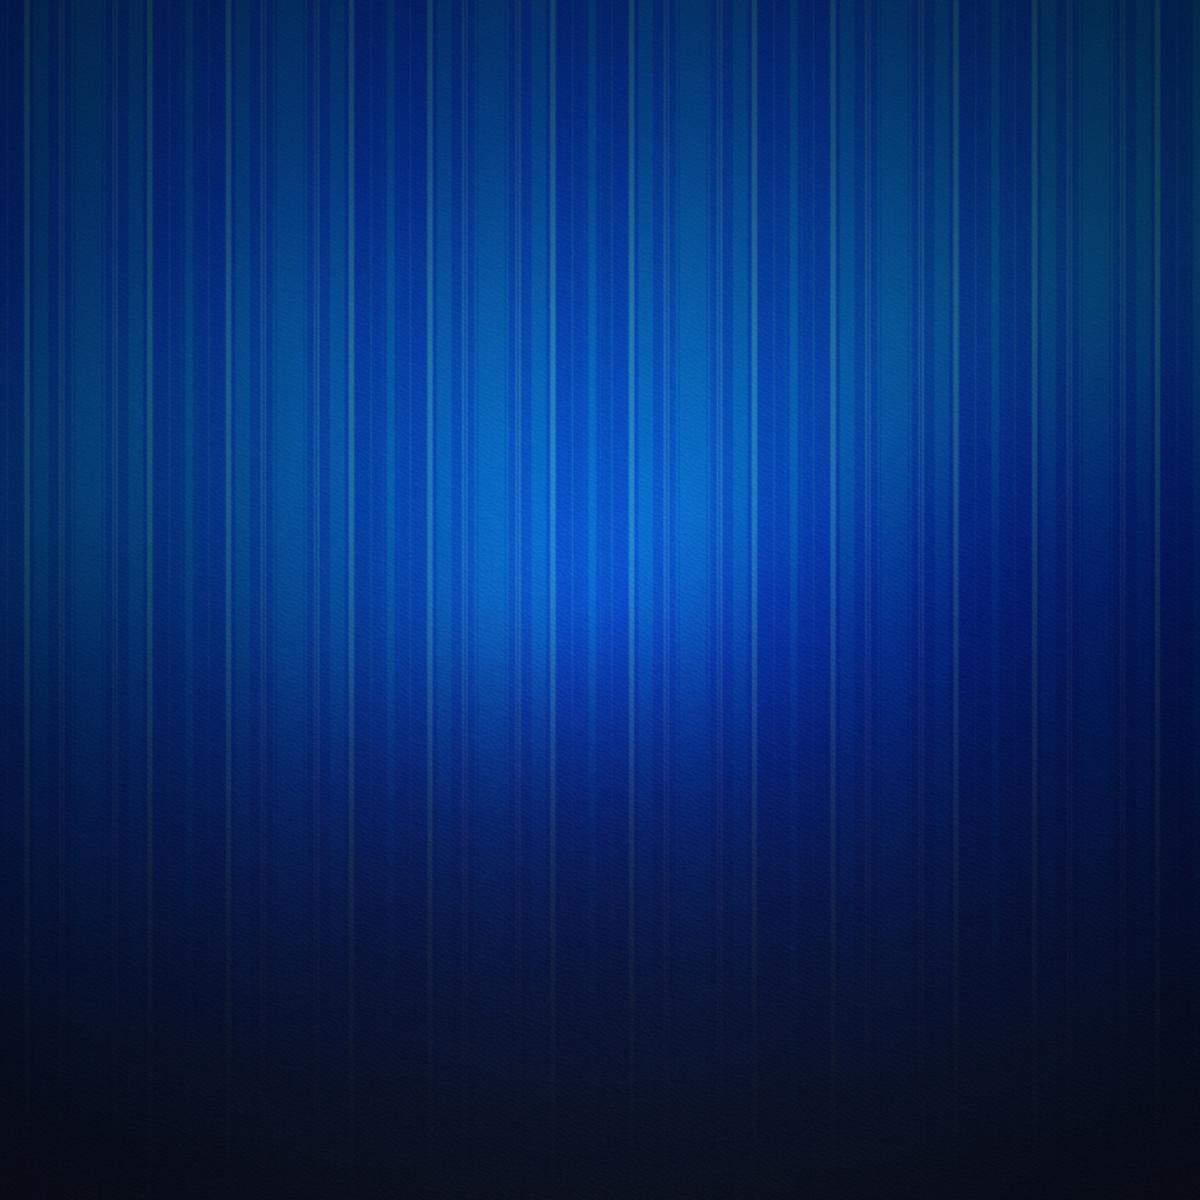 Plain Blue Backgrounds wallpaper Plain Blue Backgrounds hd wallpaper 1200x1200